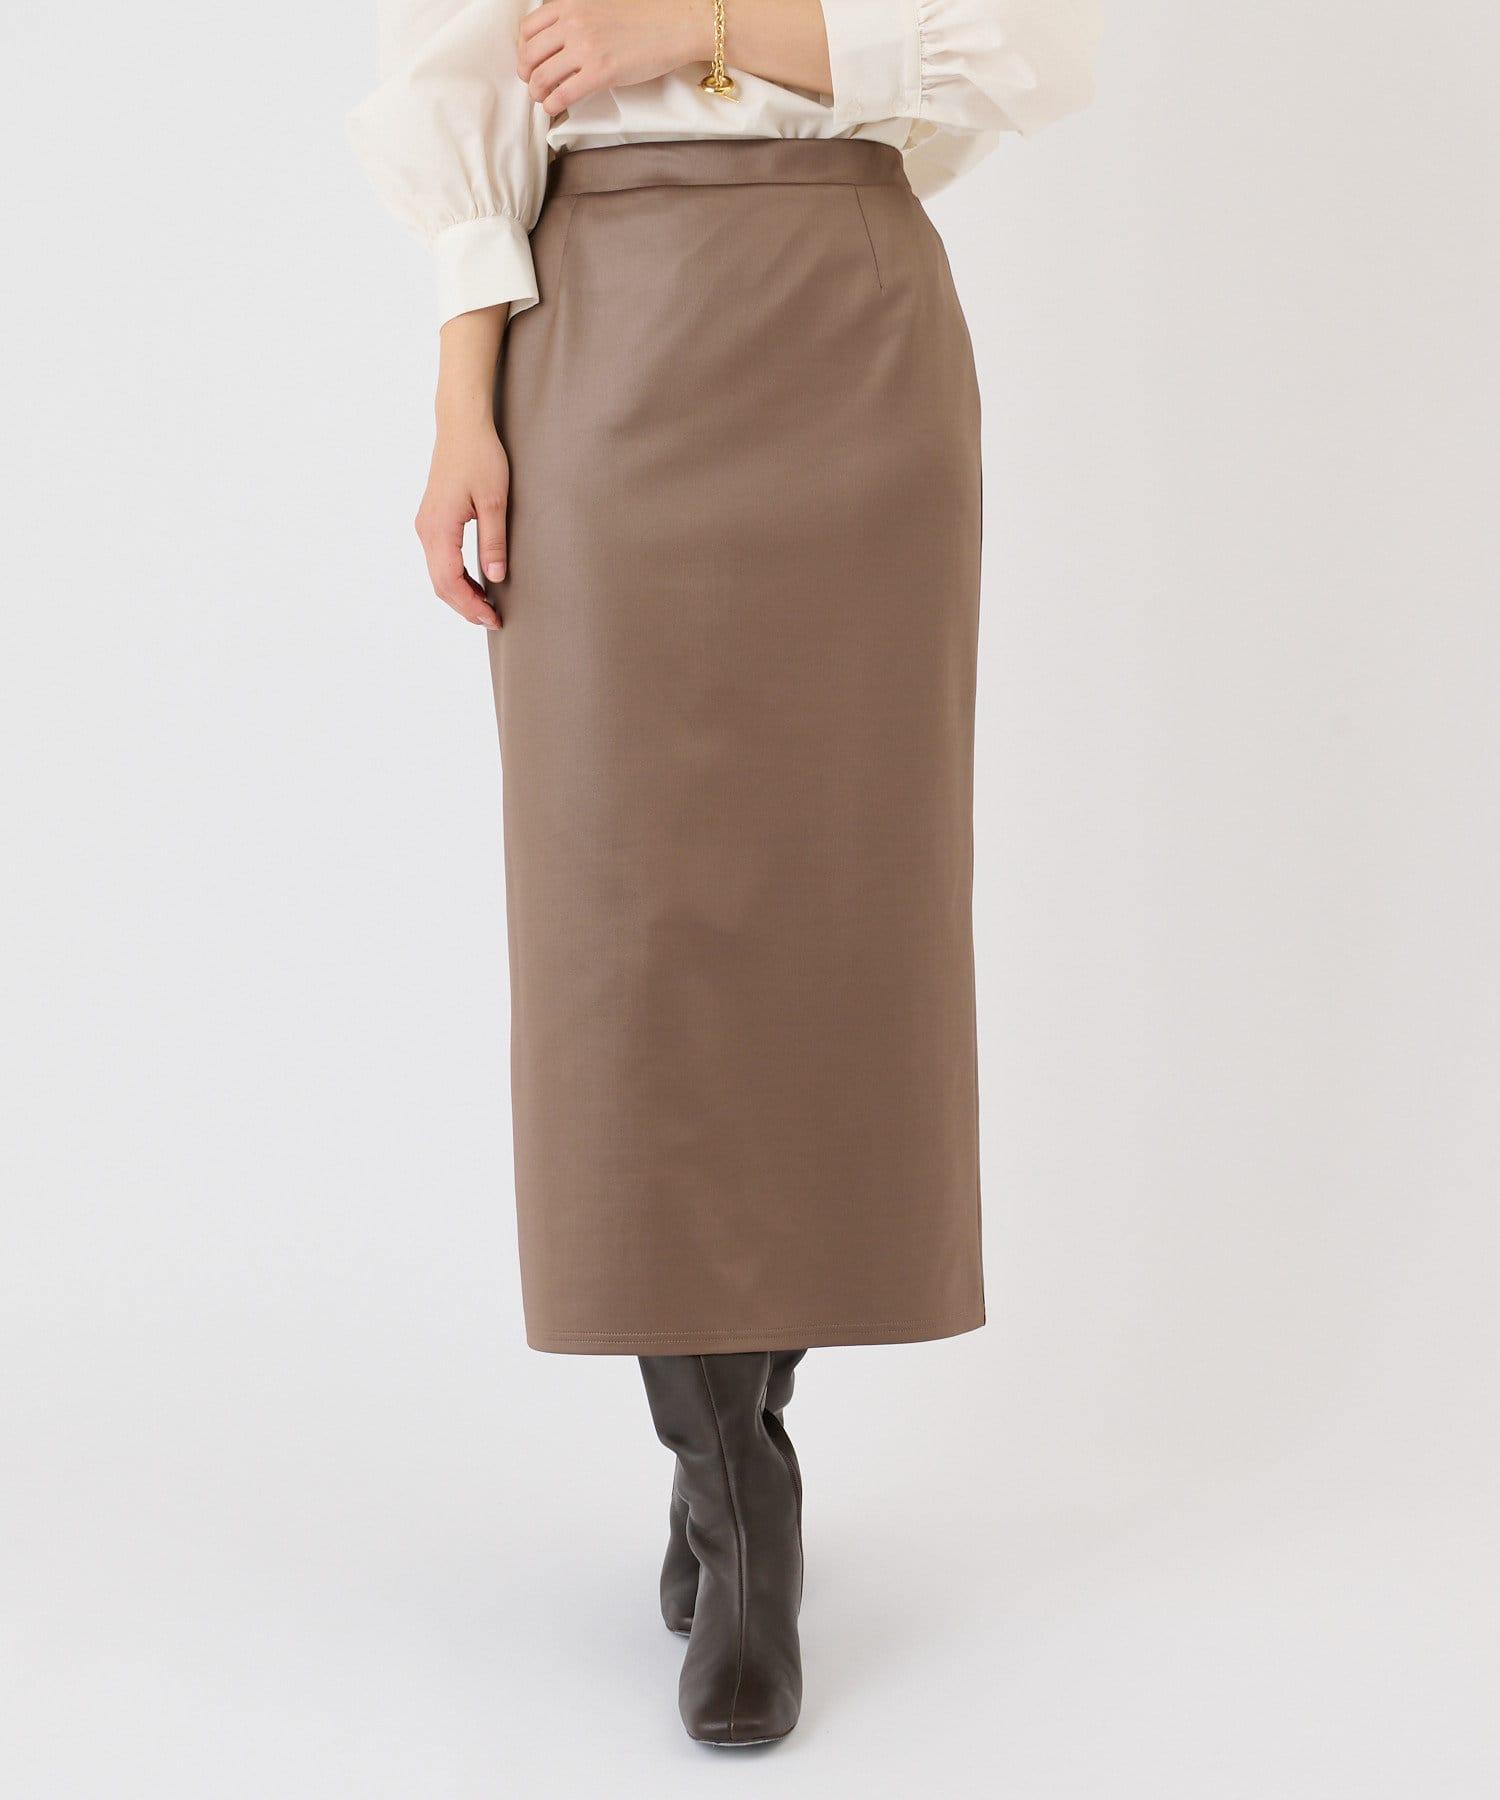 COLLAGE GALLARDAGALANTE(コラージュ ガリャルダガランテ) レザーカットスカート